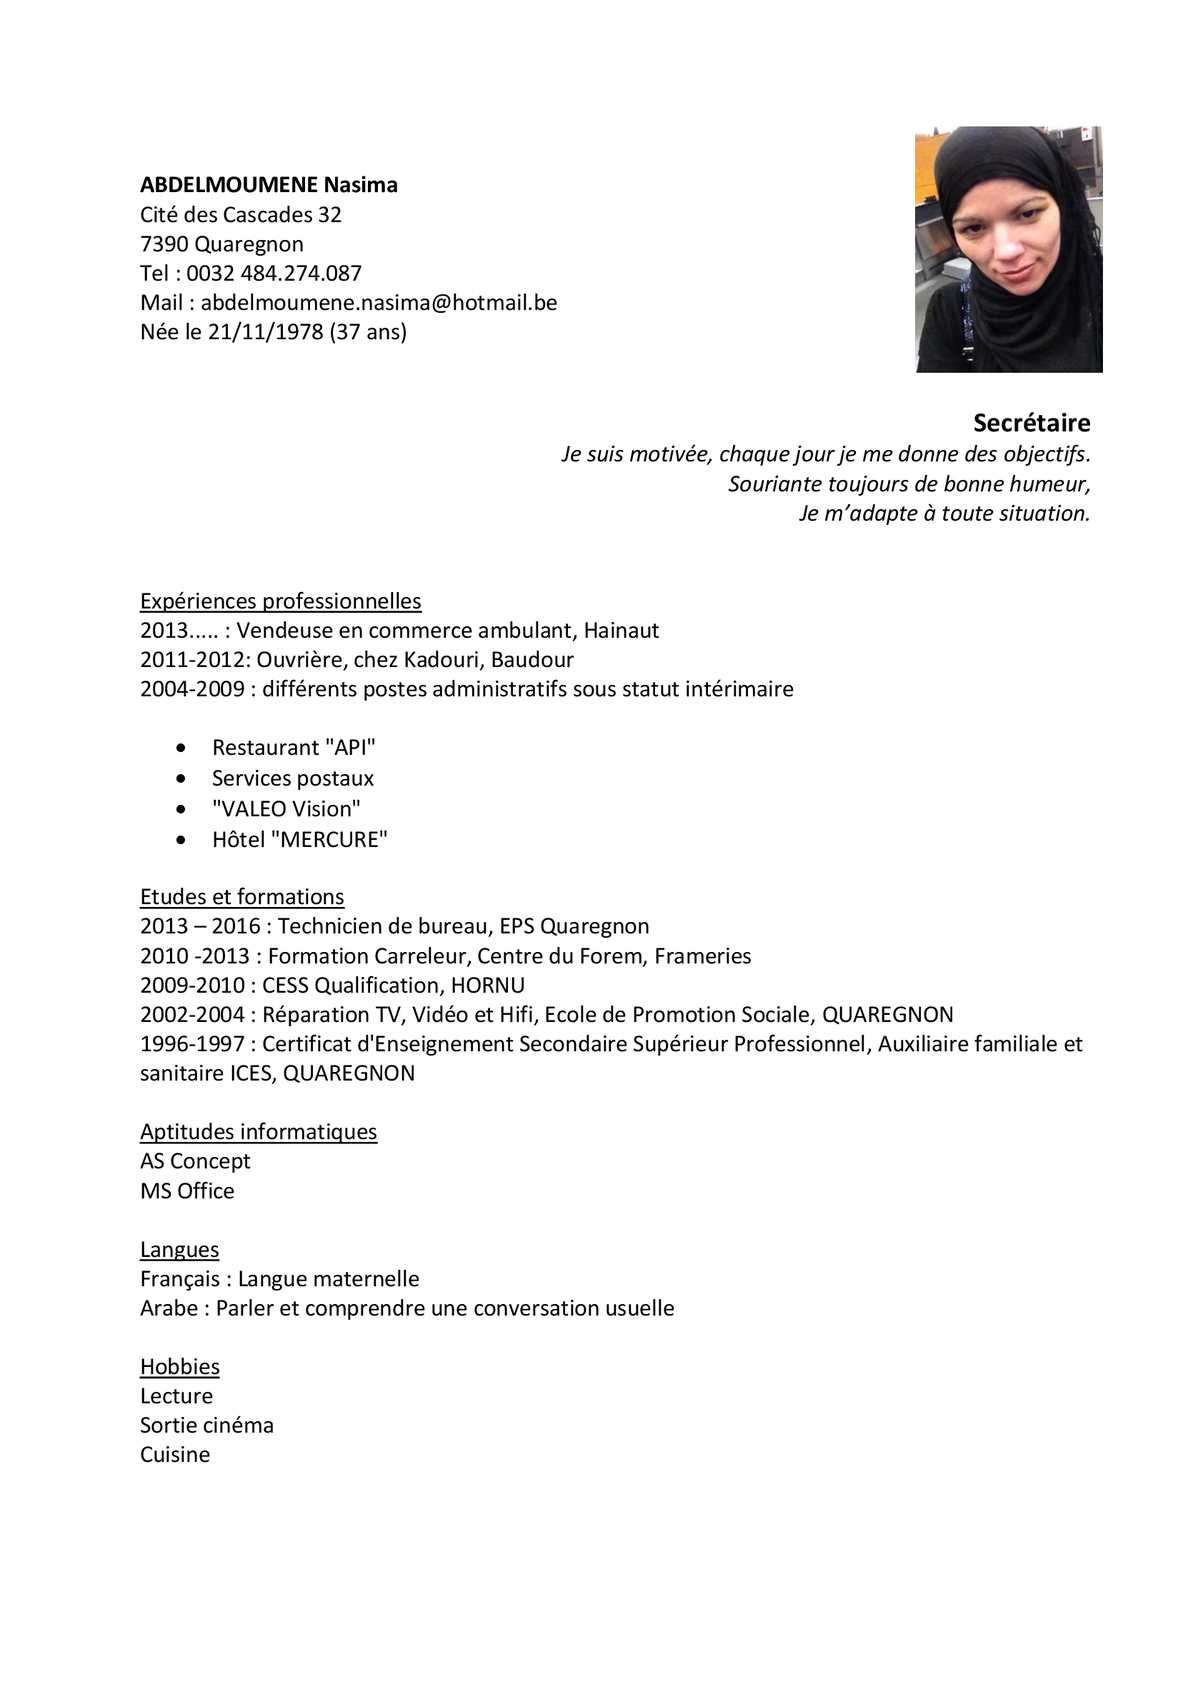 Cv Abdelmoumene Nasima 2015 Secretairedocx Commerce Ambulant Humeur Hainaut